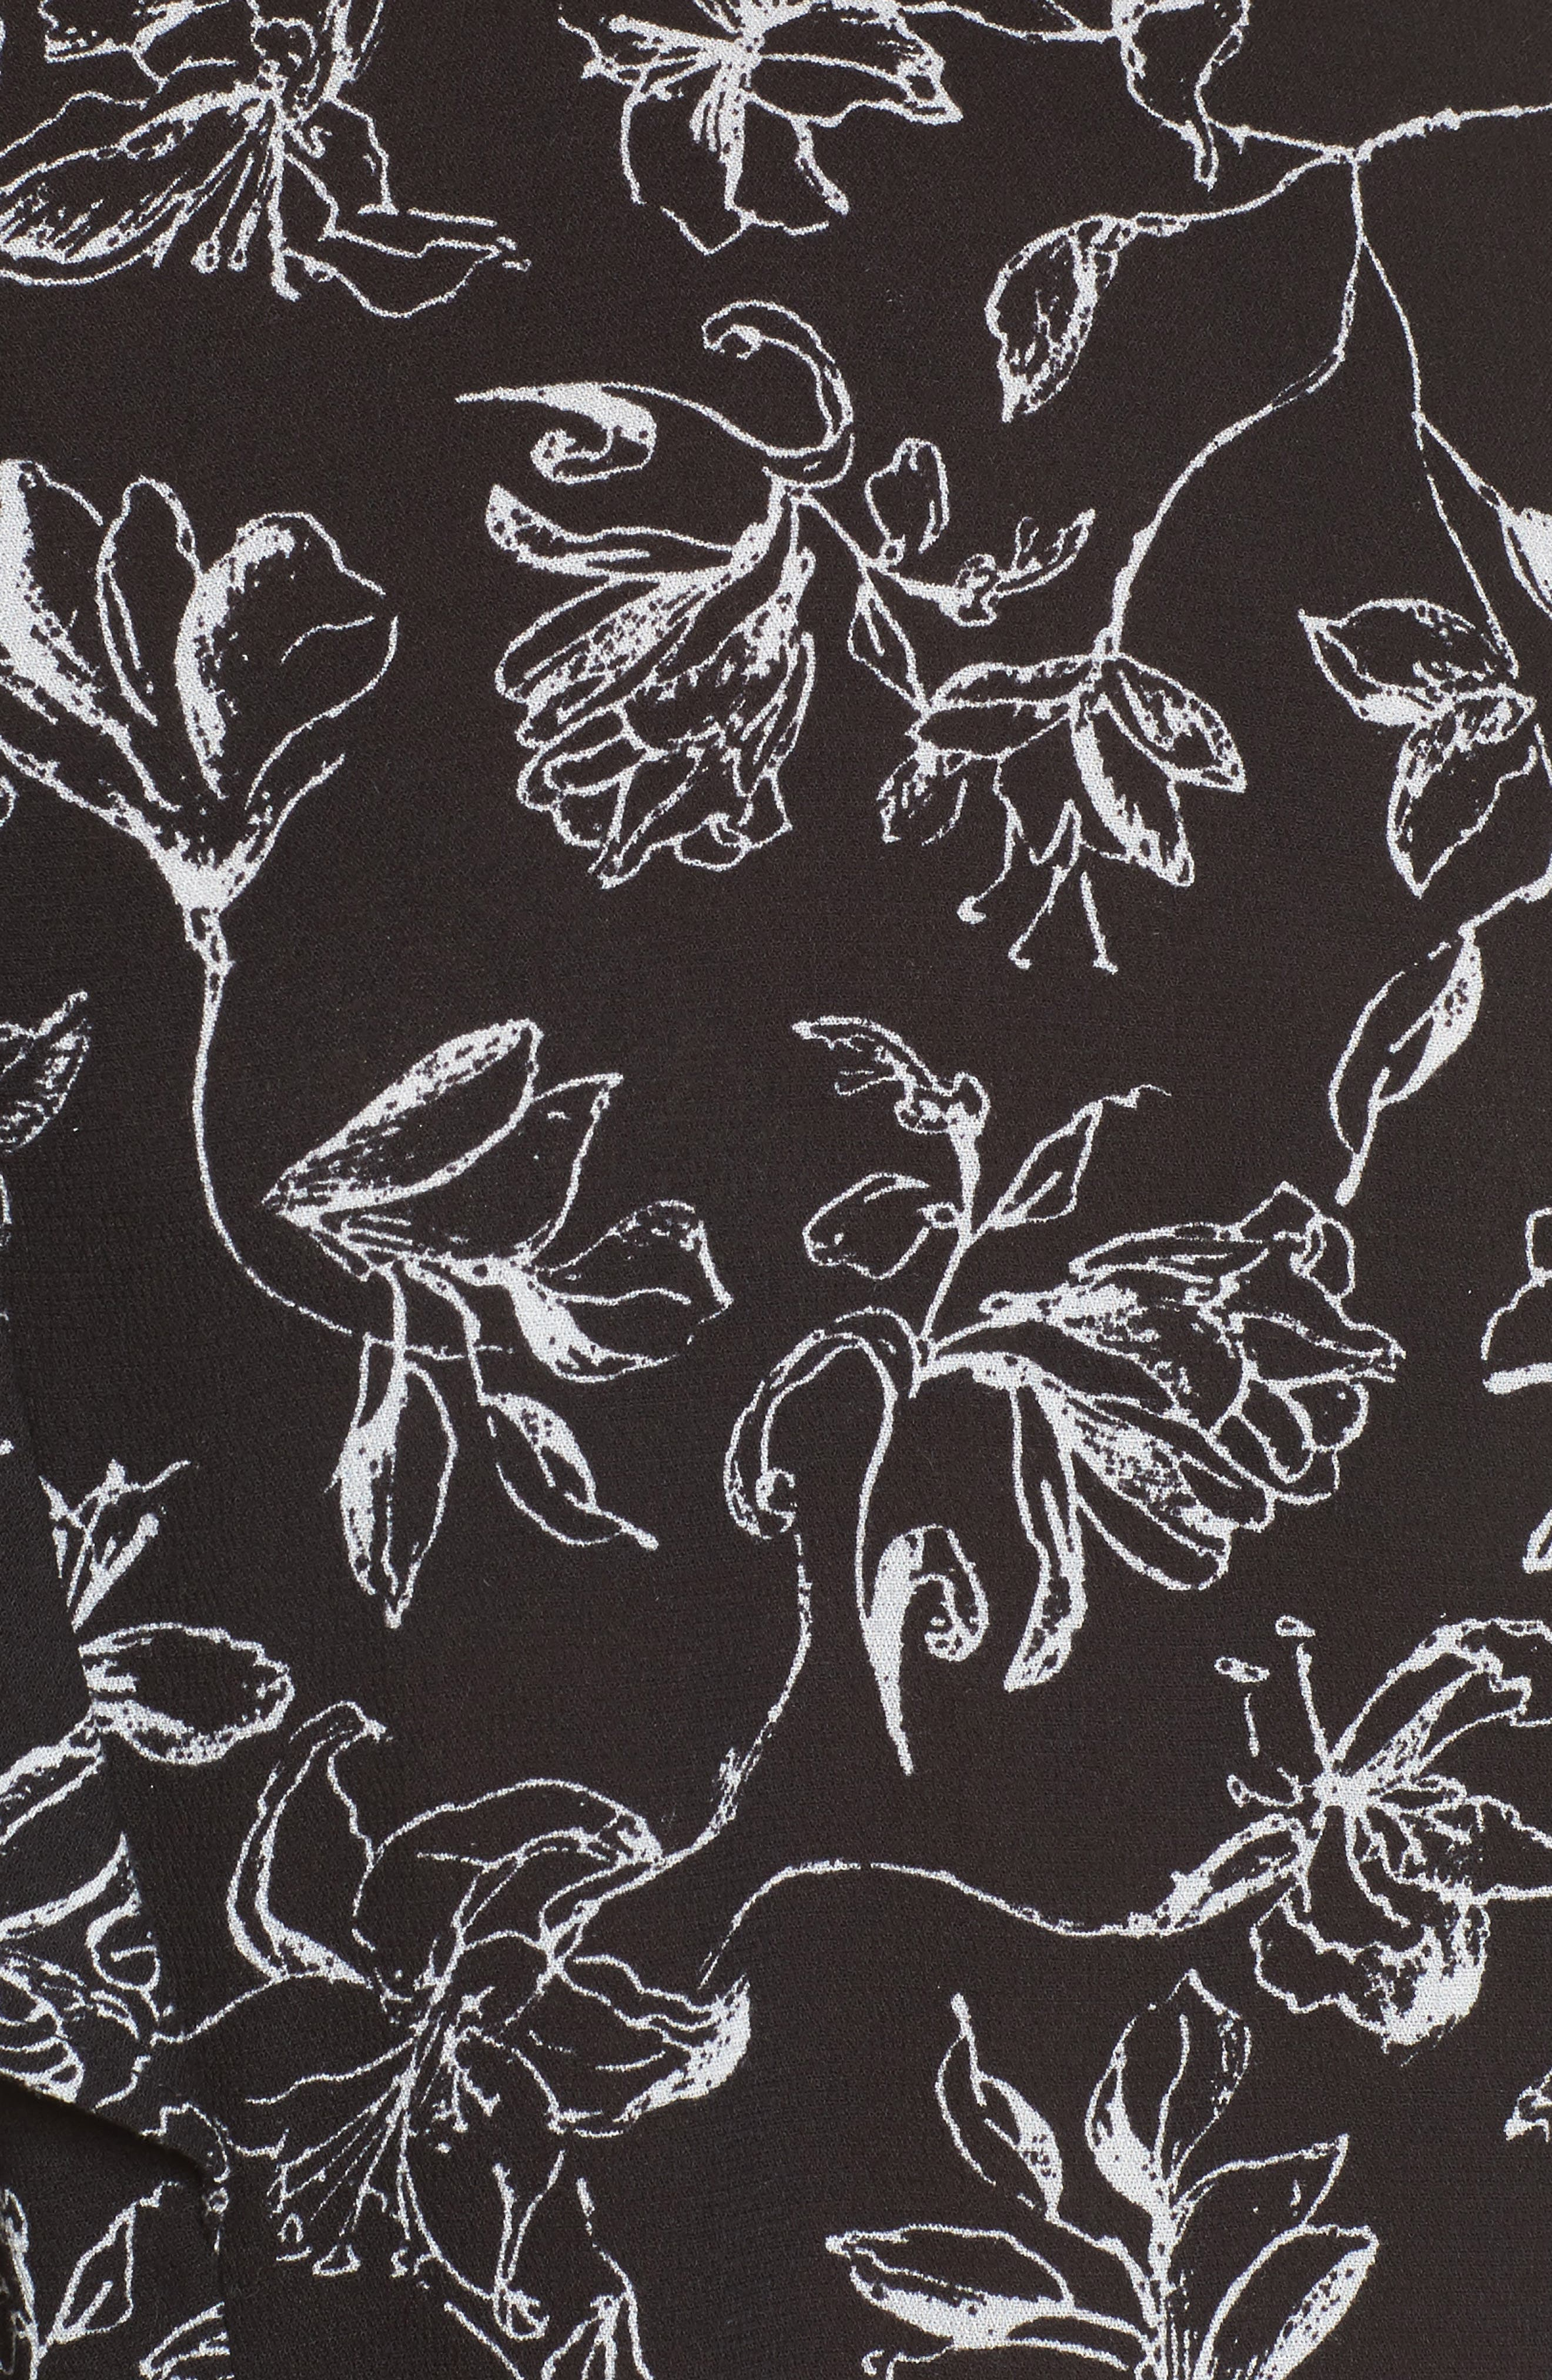 Floral Print Ruffle Blouse,                             Alternate thumbnail 9, color,